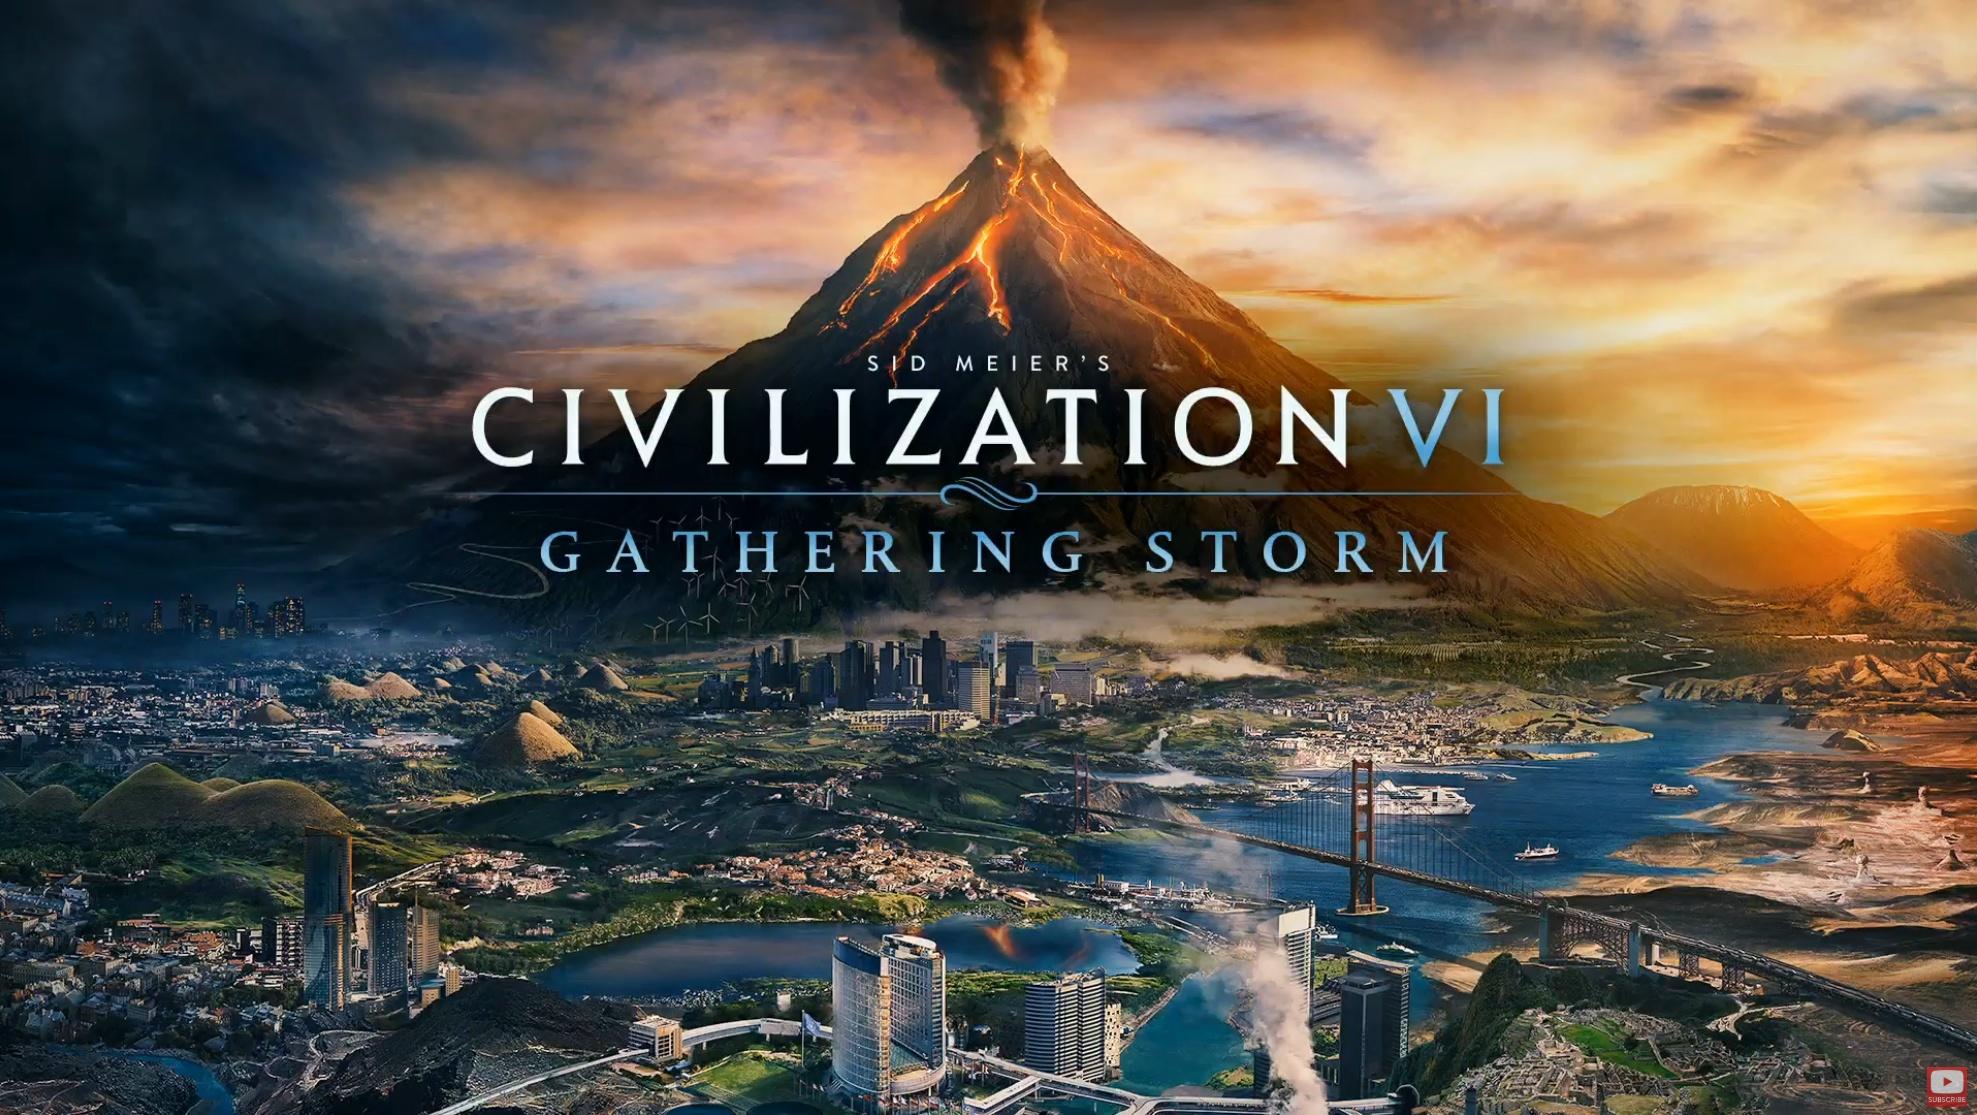 https://vignette.wikia.nocookie.net/civilization/images/b/b2/Gathering_Storm.jpg/revision/latest?cb=20181120190417